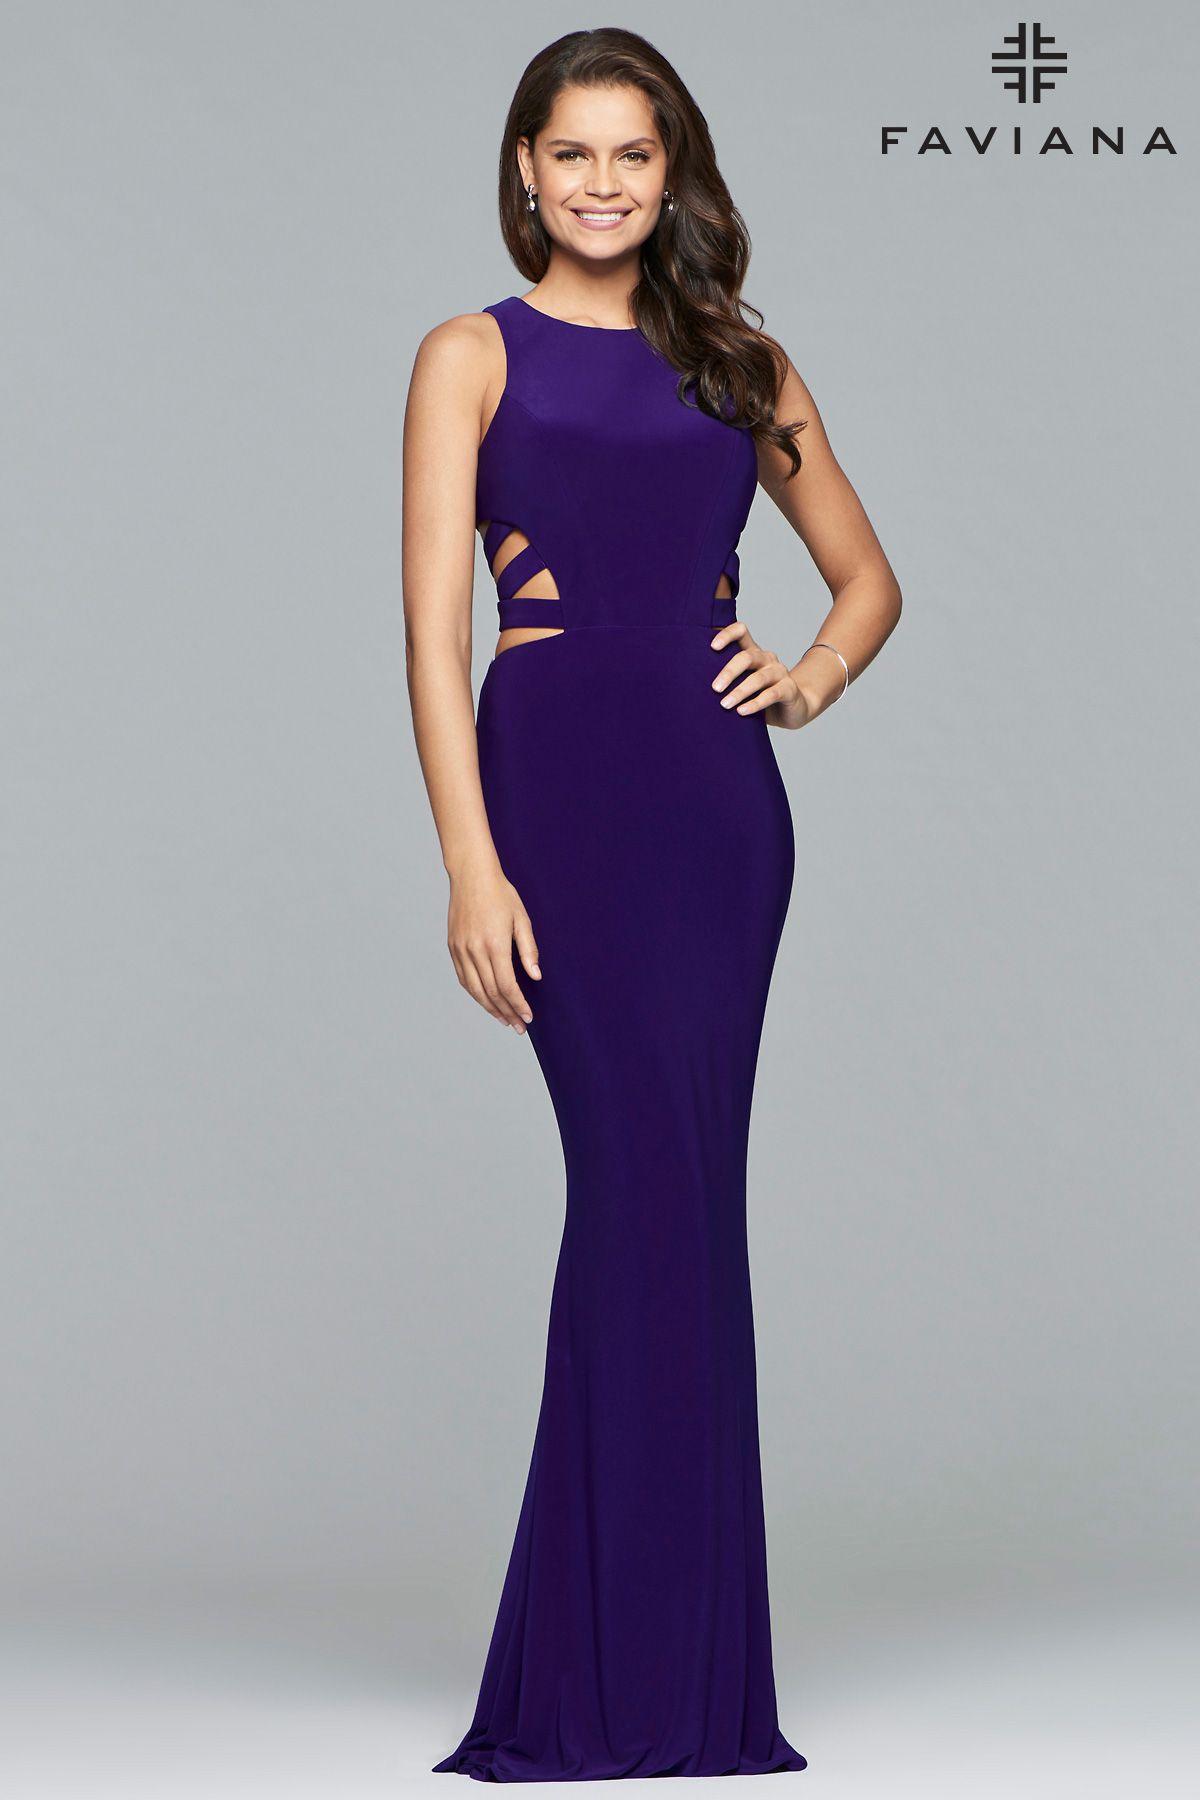 all faviana dresses pinterest unique prom dresses